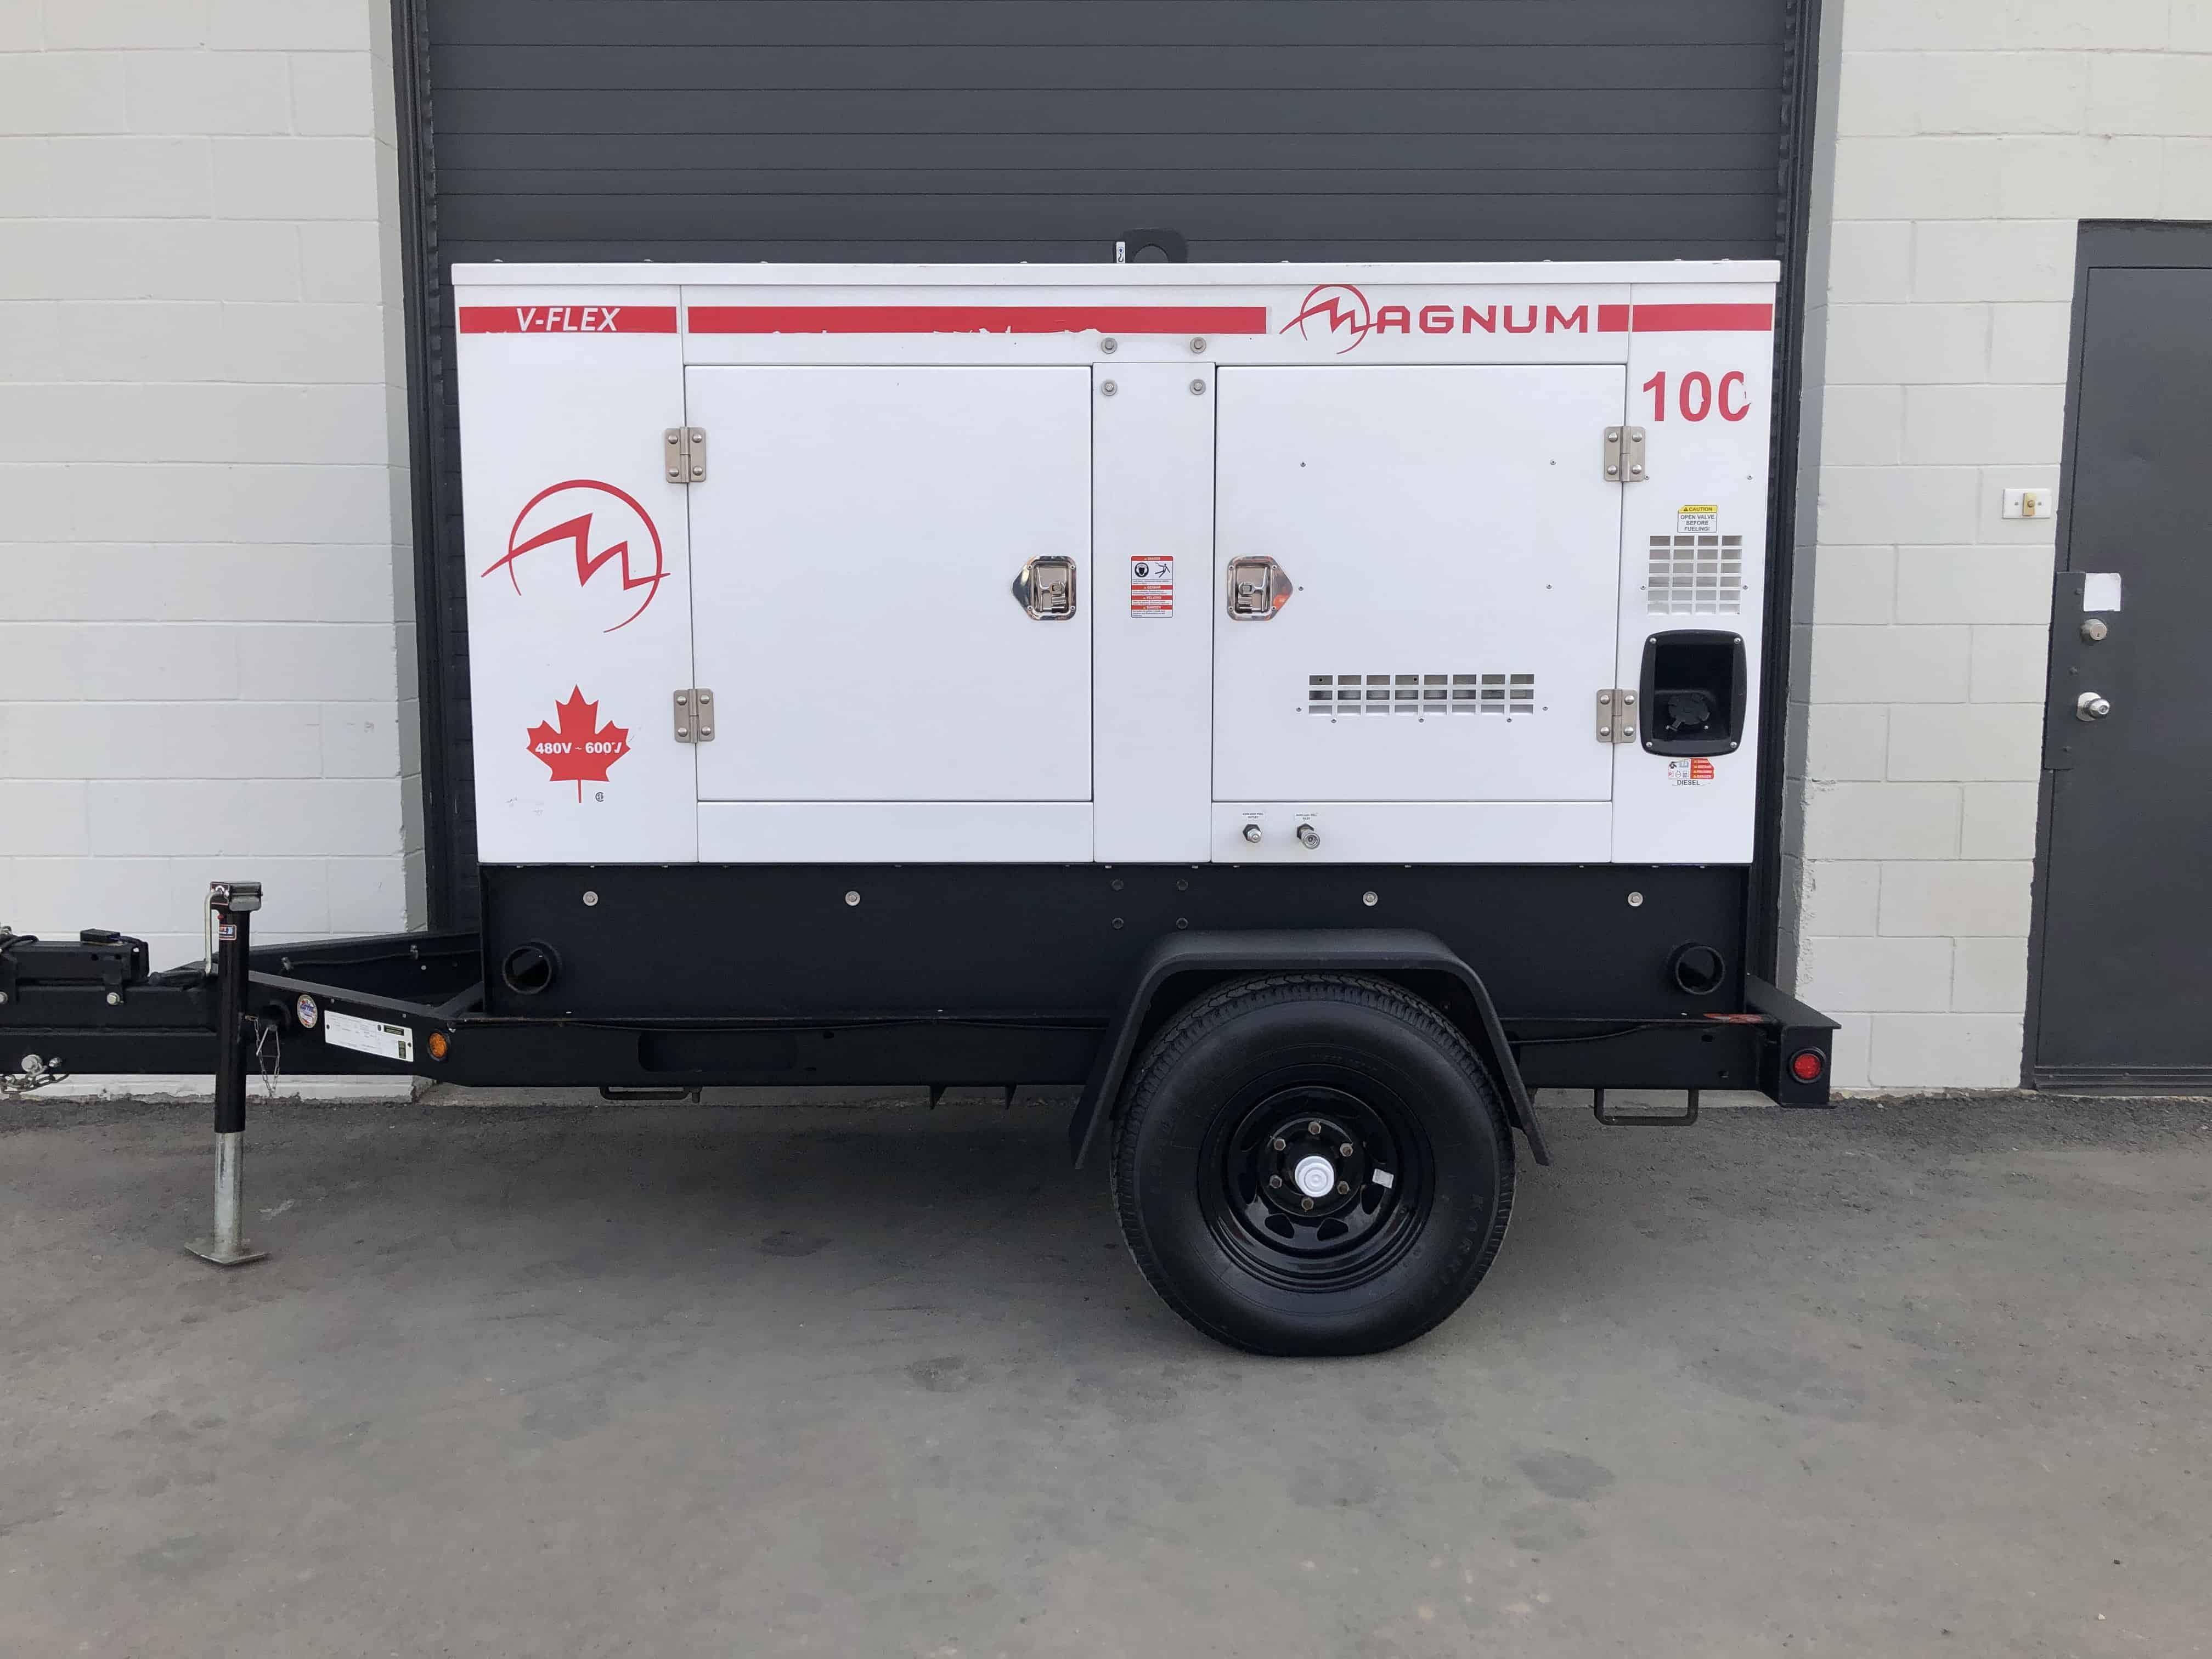 Used Magnum Generac MMG100CAN6 generator for sale in Winnipeg Manitoba